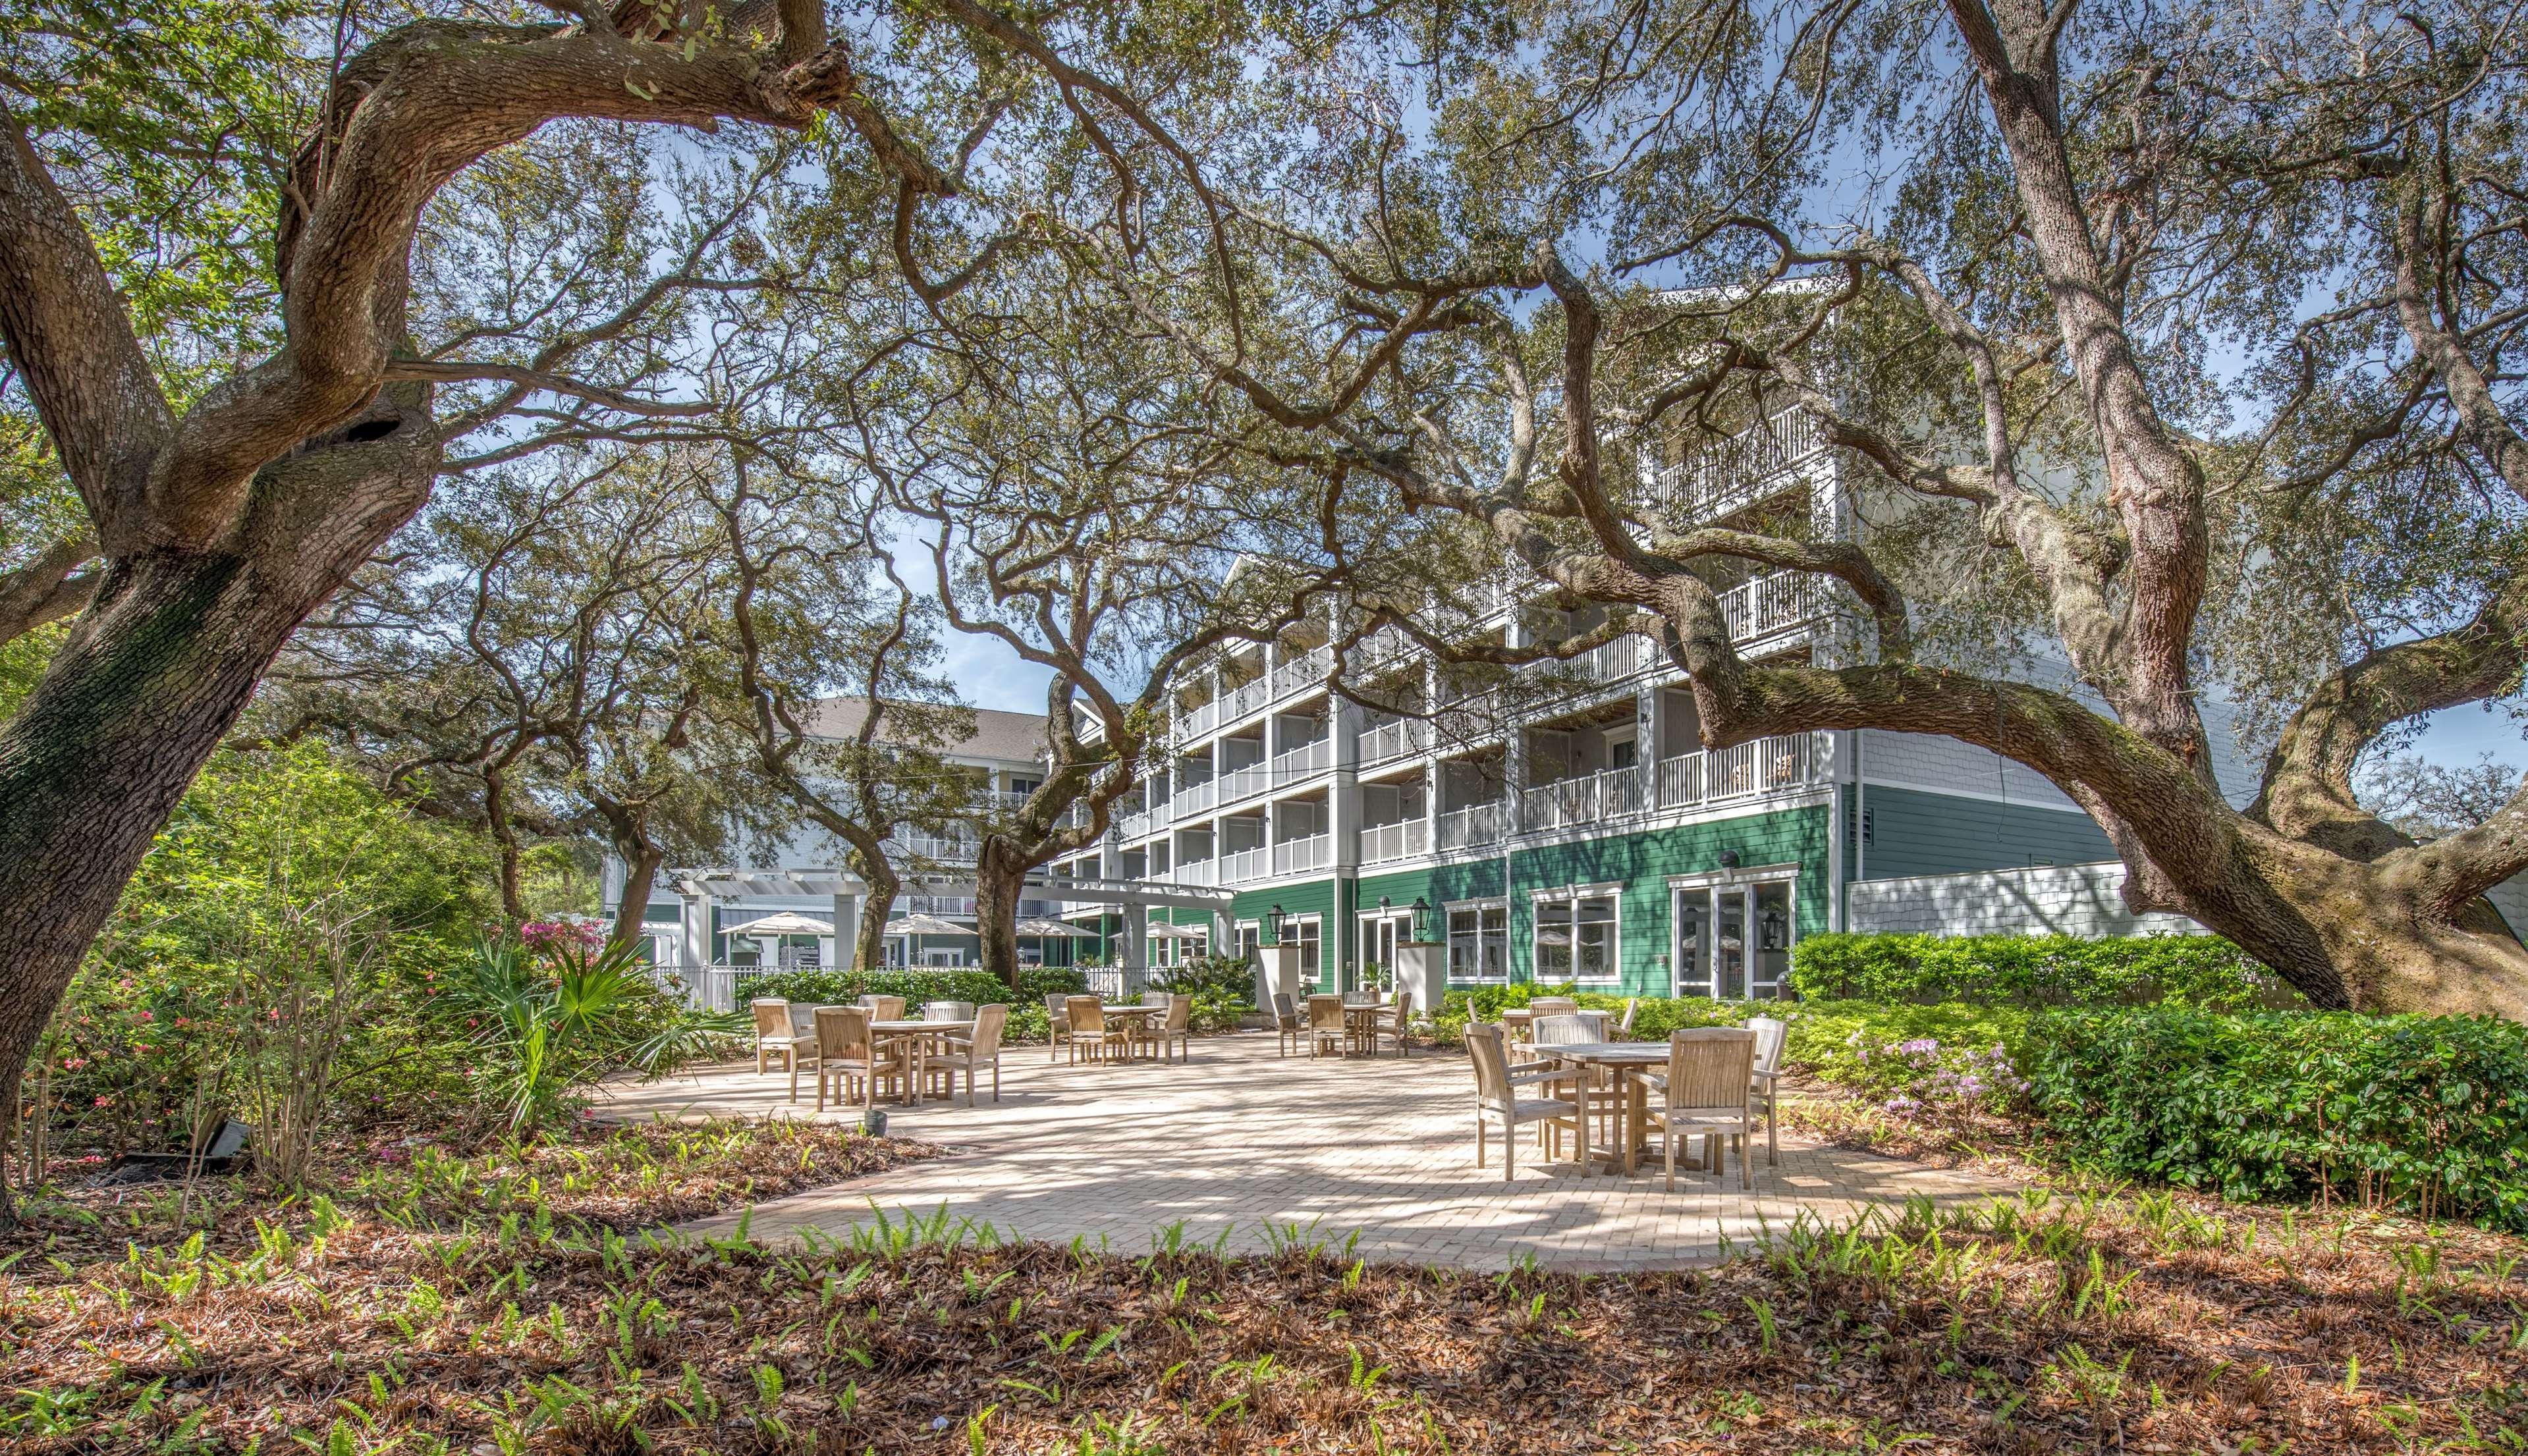 hampton inn suites jekyll island at 200 south beachview. Black Bedroom Furniture Sets. Home Design Ideas